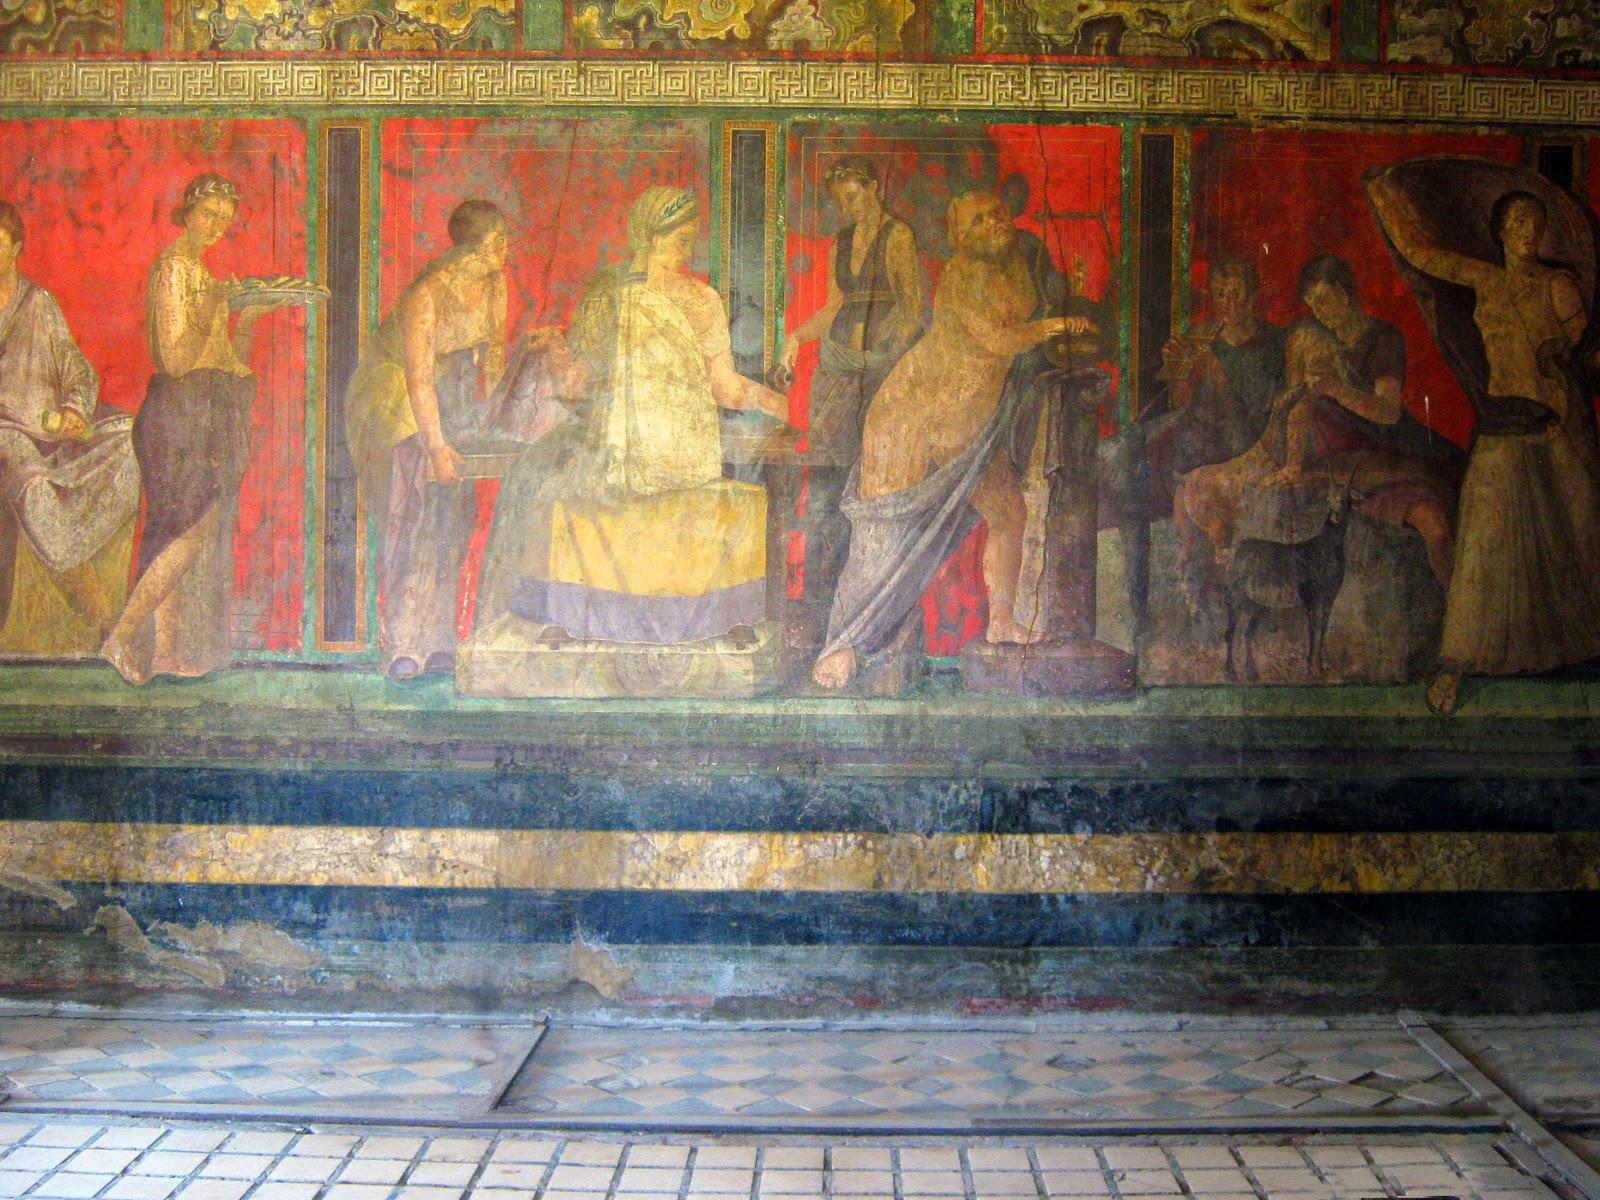 08-07-07_227_Italien-Urlaub%253B_Pompeji%252C_Villa_dei_Misteri%252C_Wandmalerei.jpg